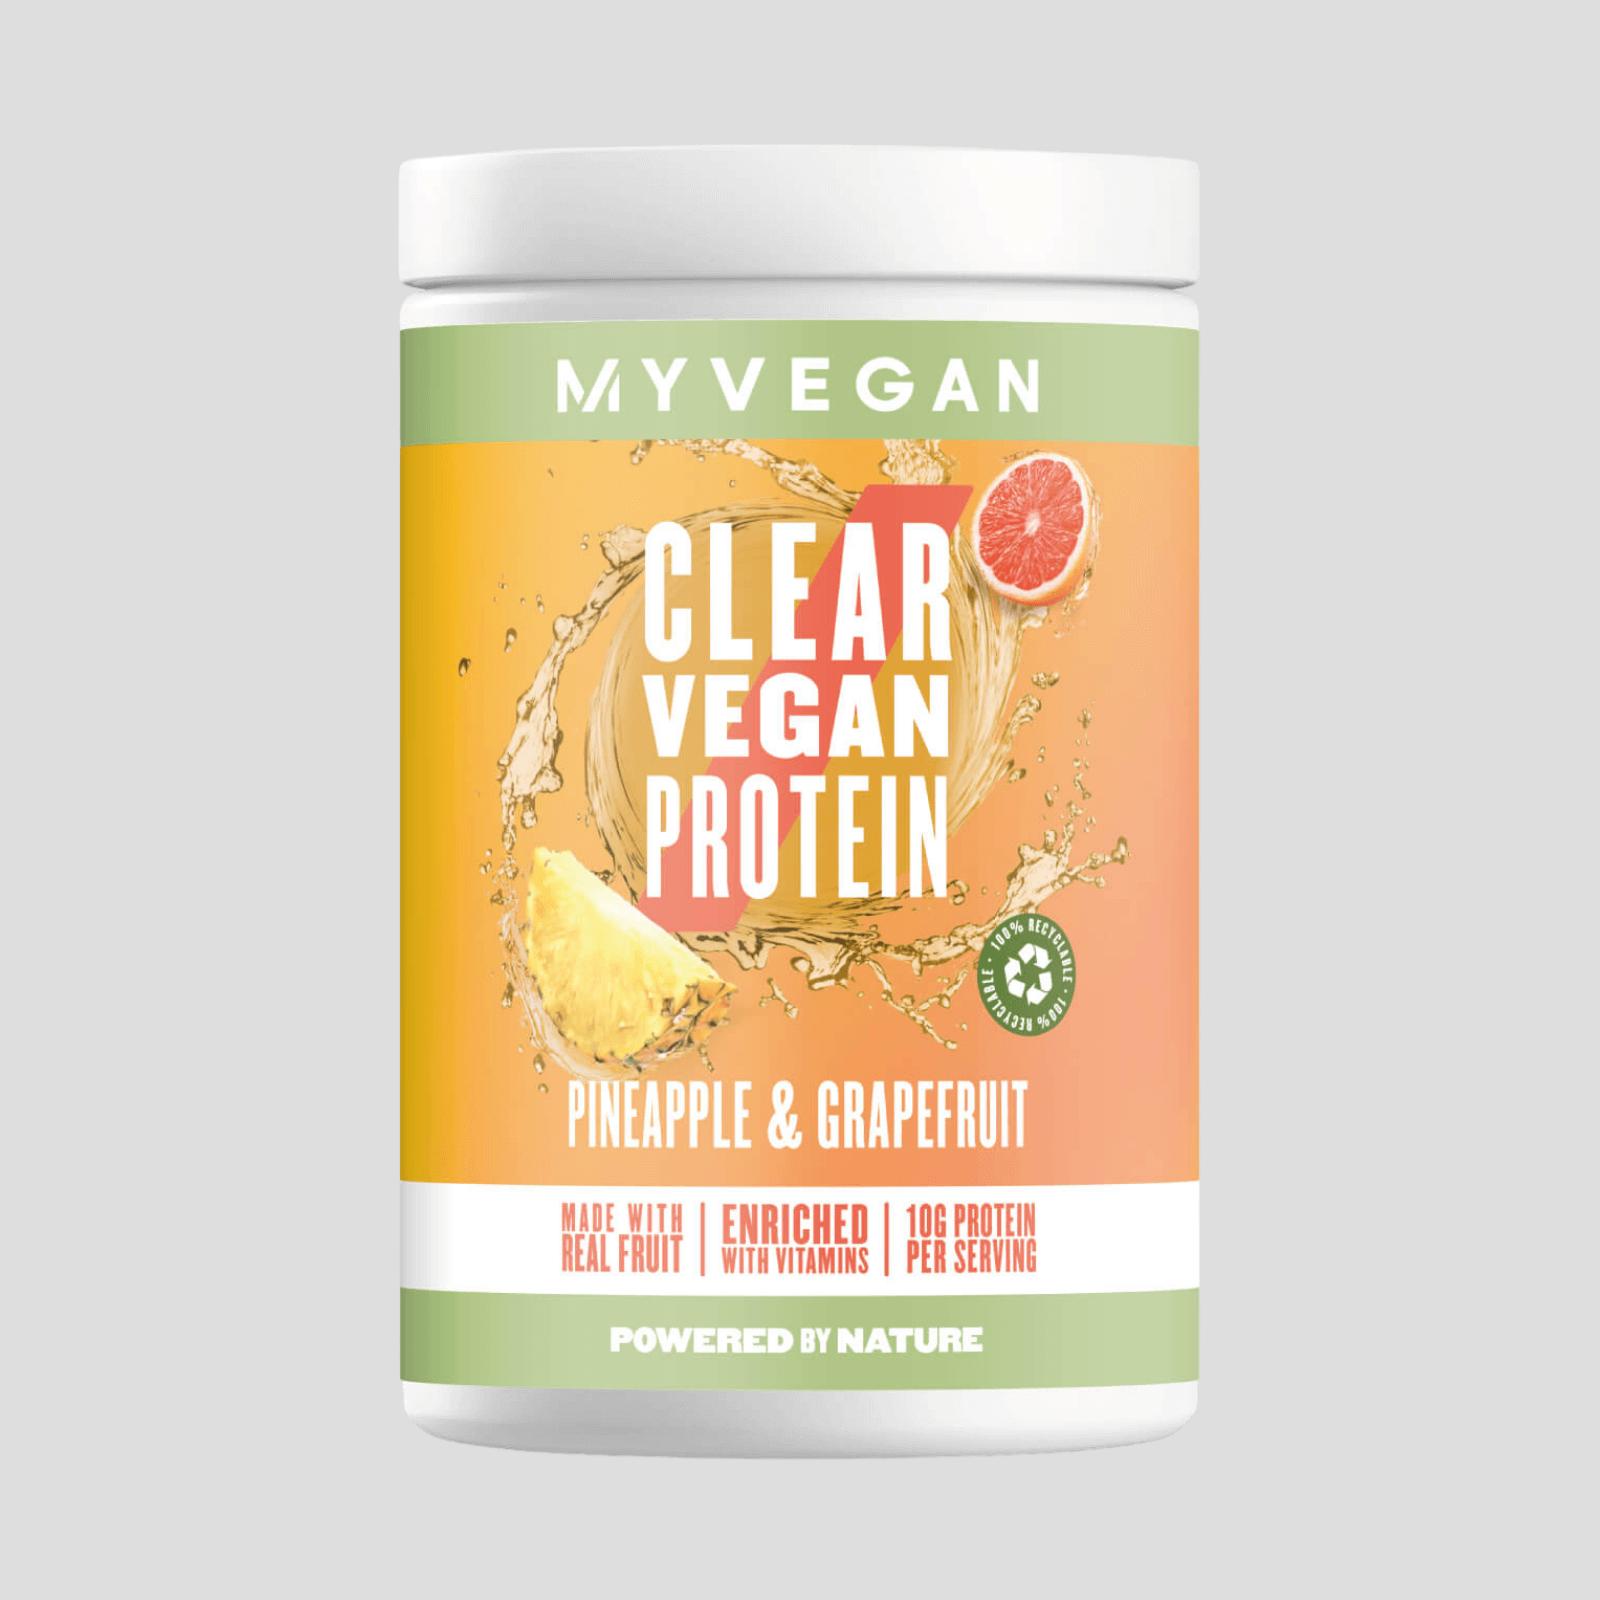 Clear Vegan Protein - 20servings - Pineapple & Grapefruit